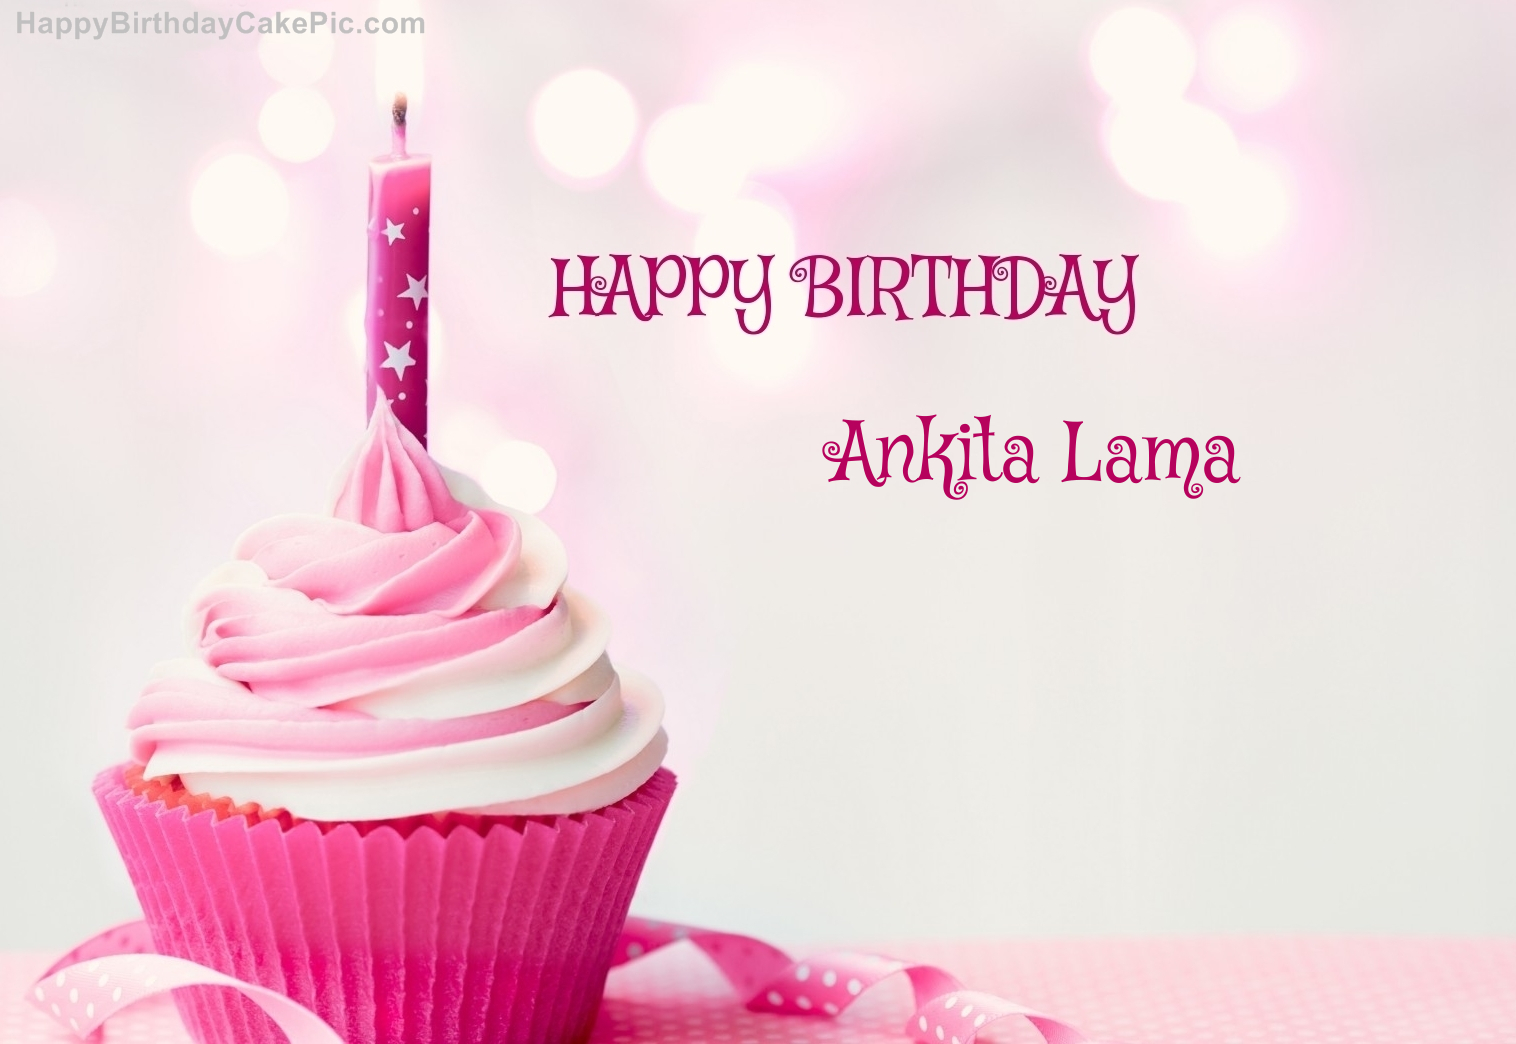 Birthday Cake Images With Name Ankit : Happy Birthday Cupcake Candle Pink Cake For Ankita Lama